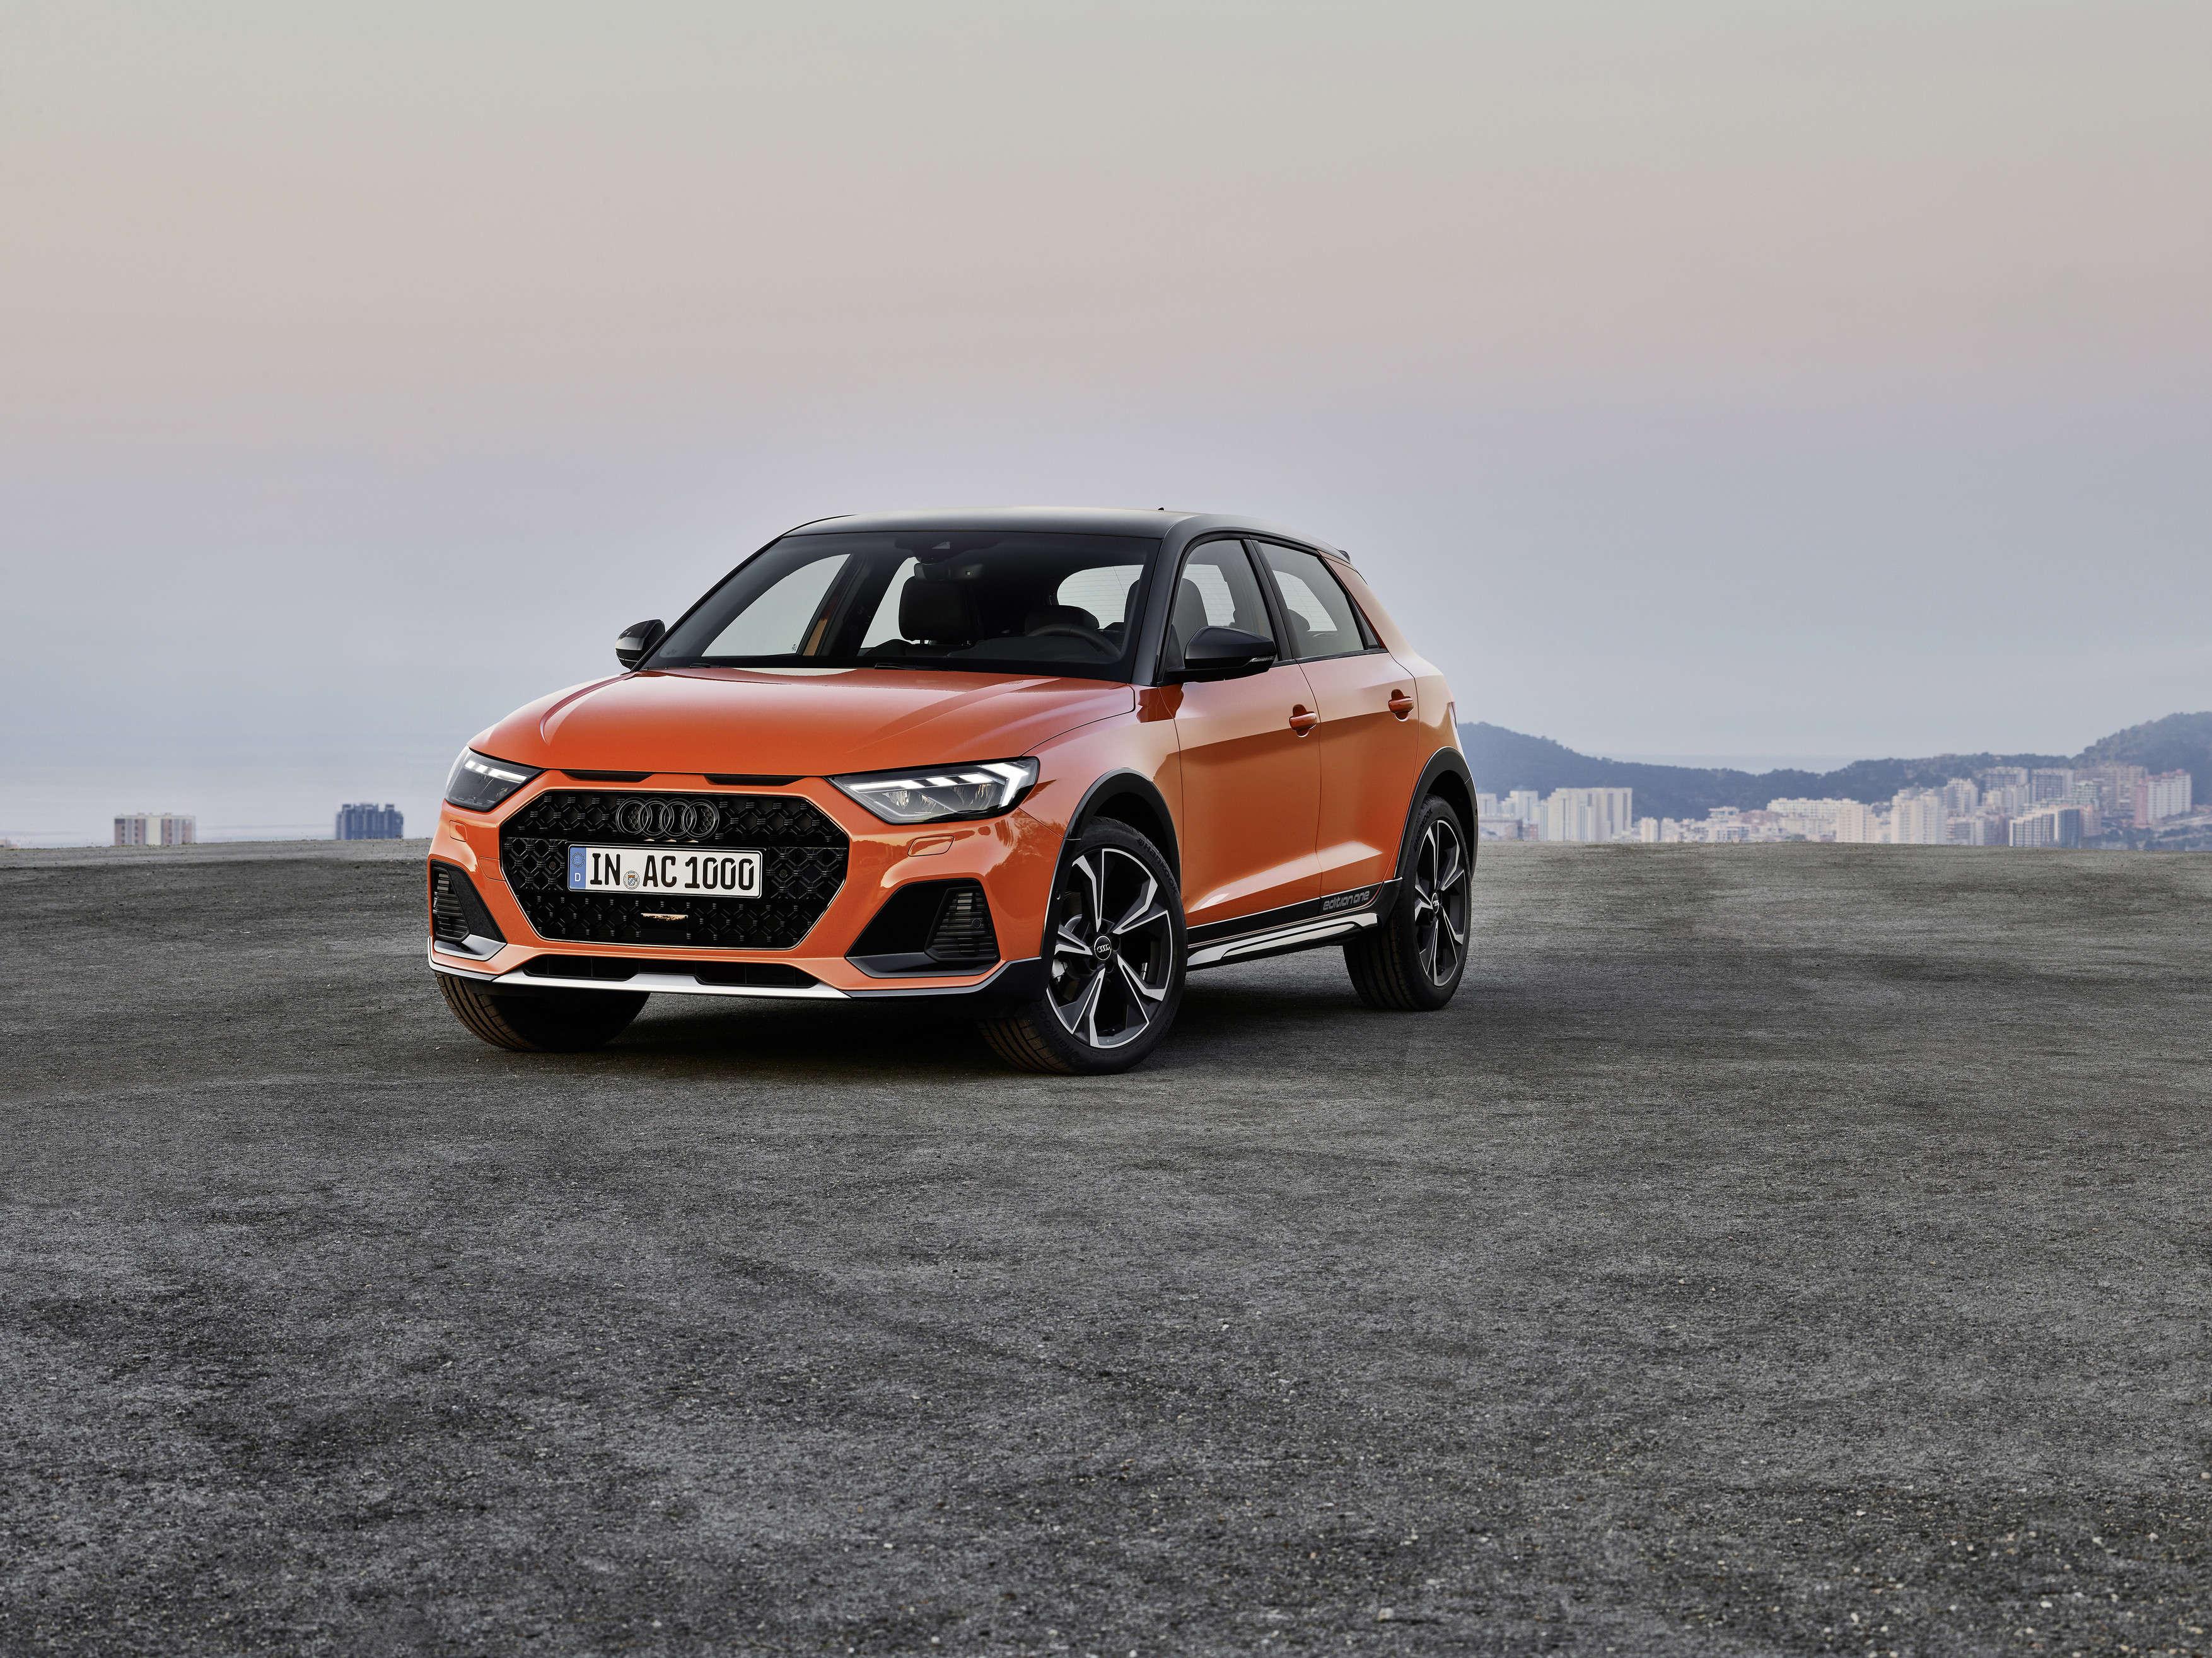 European Auto Expo >> Audi A1 Citycarver Audi Unveils A1 Citycarver In Europe Auto News